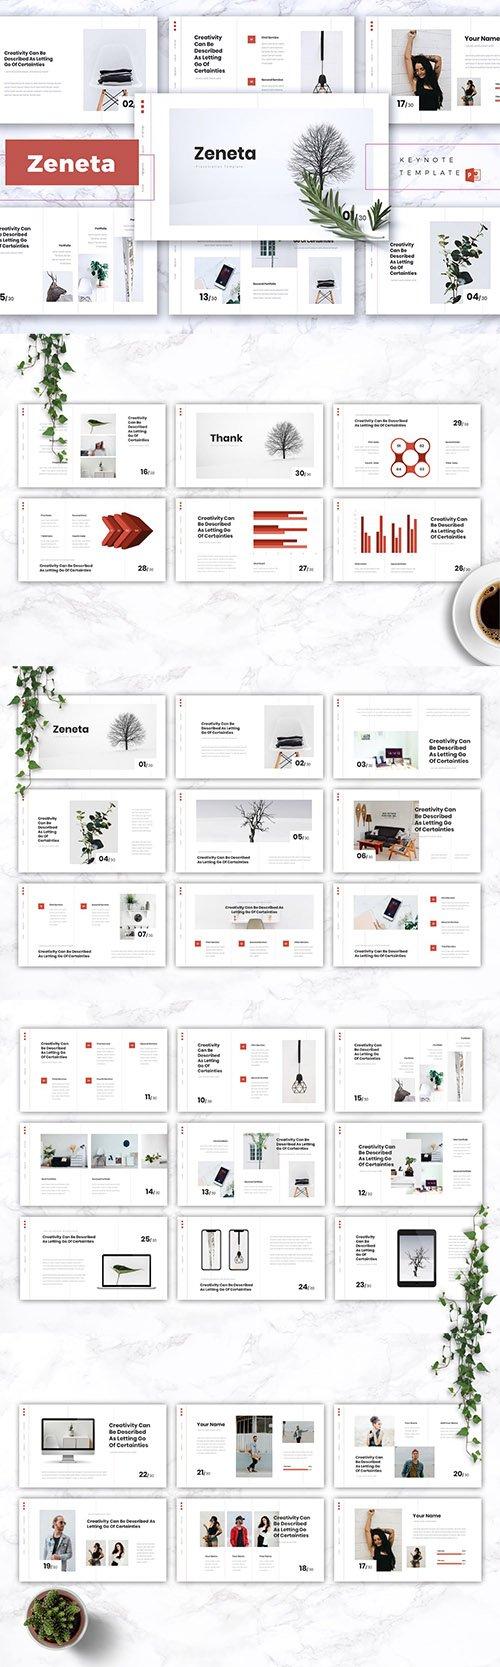 ZENETA - Creative Powerpoint, Keynote and Google Slides Templates